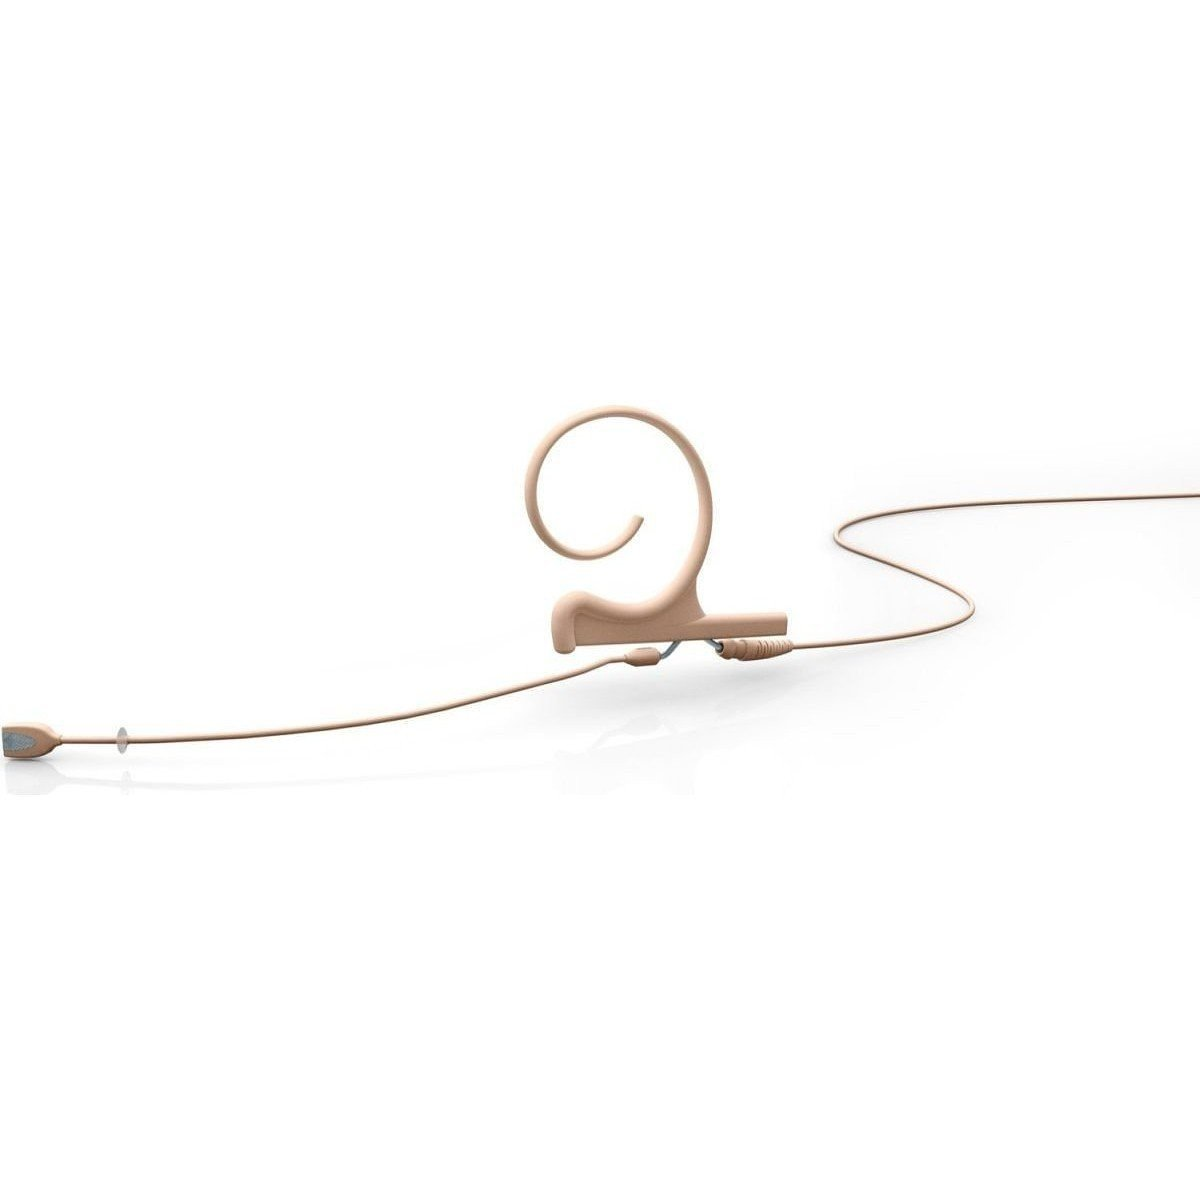 DPA FIDF10-M   d:fine Directional Headset Single Ear Microphone TA4F Adaptor for Shure Beige